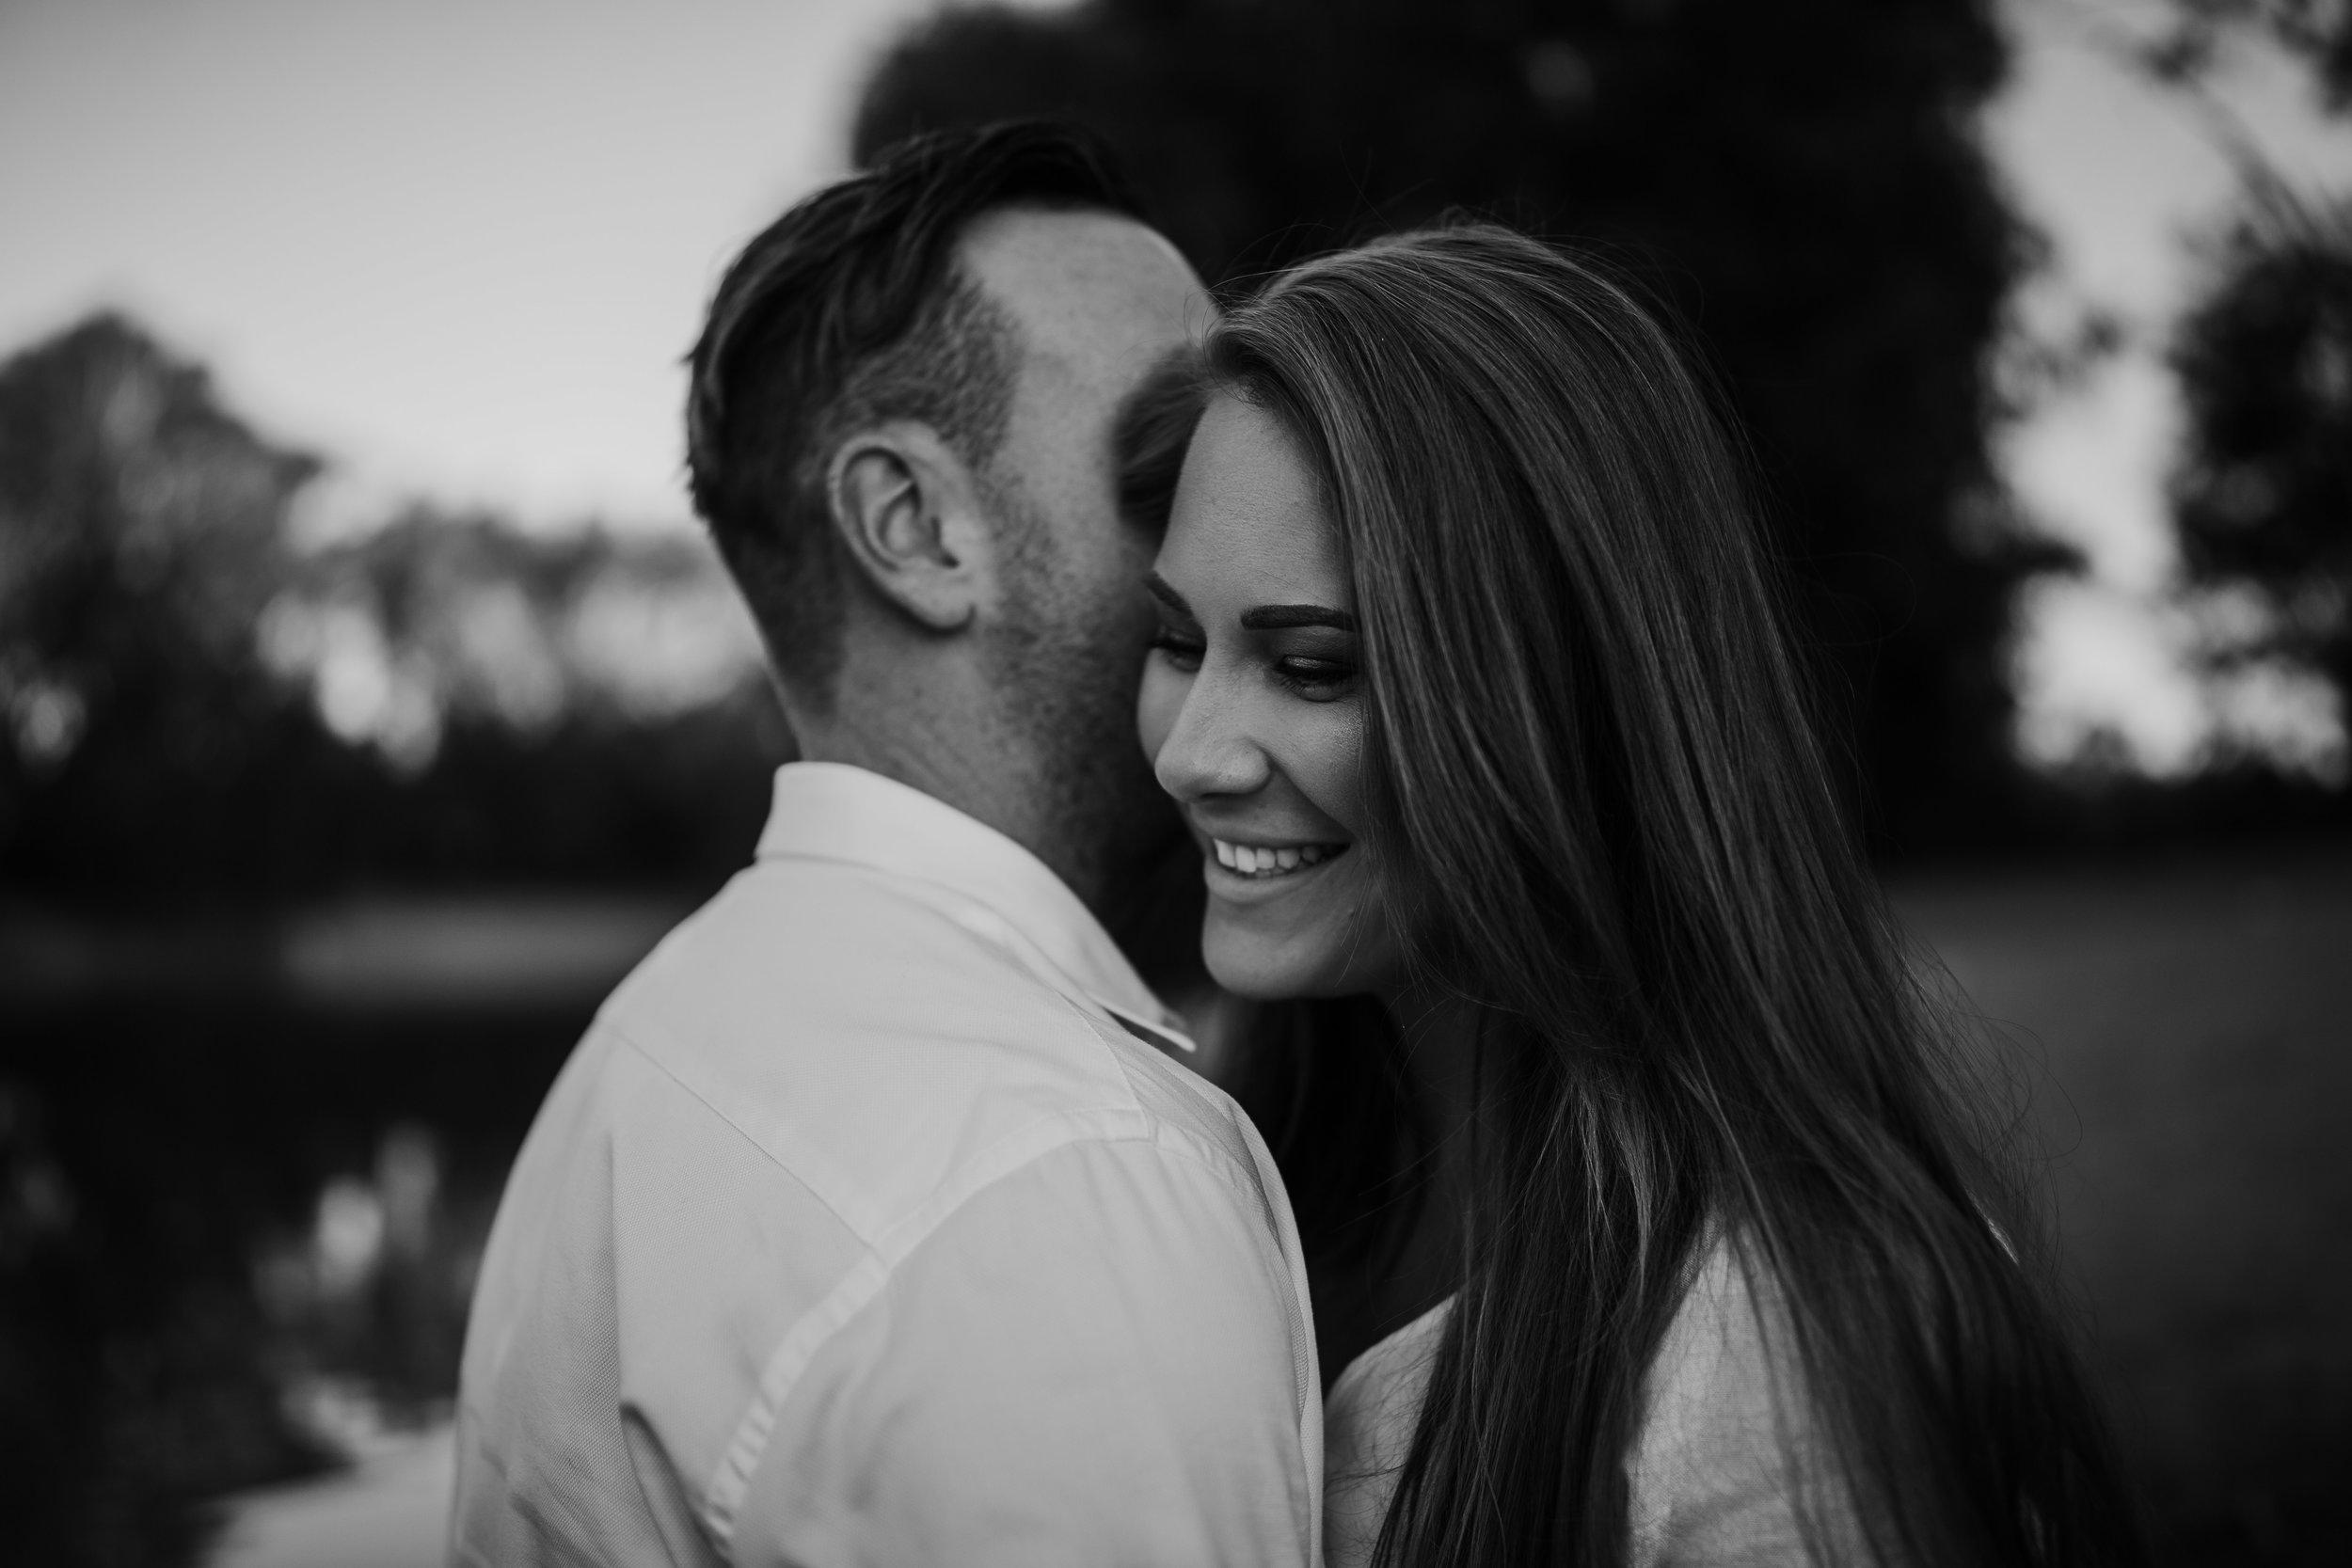 mickalathomas_puremacphotography_weddingphotographer_couplephotographer_Sheppartonphotographer_2831.jpg